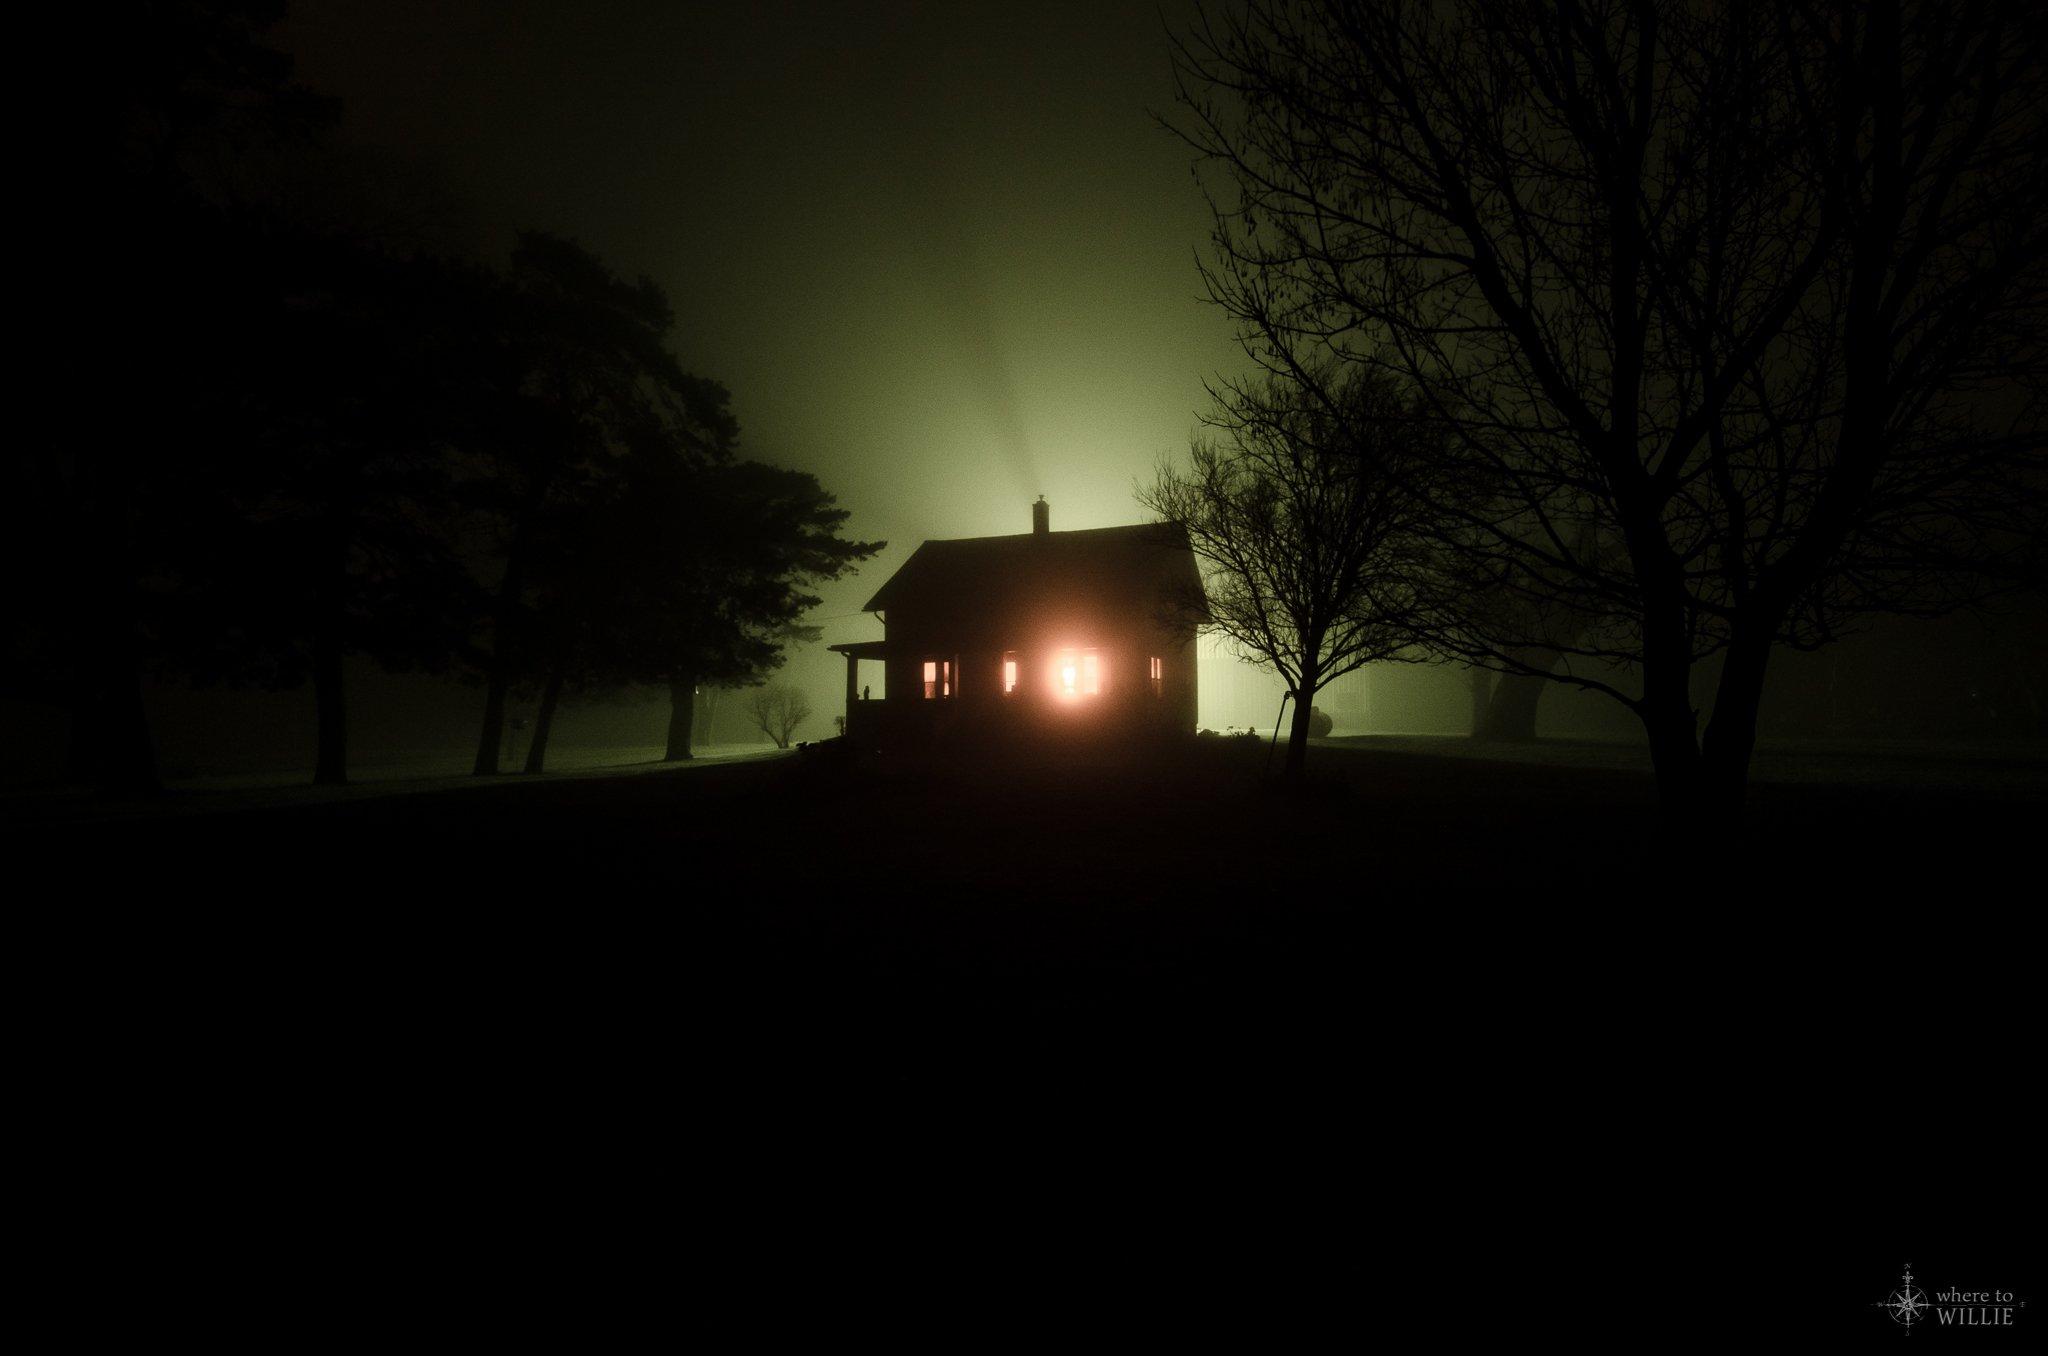 One lone night